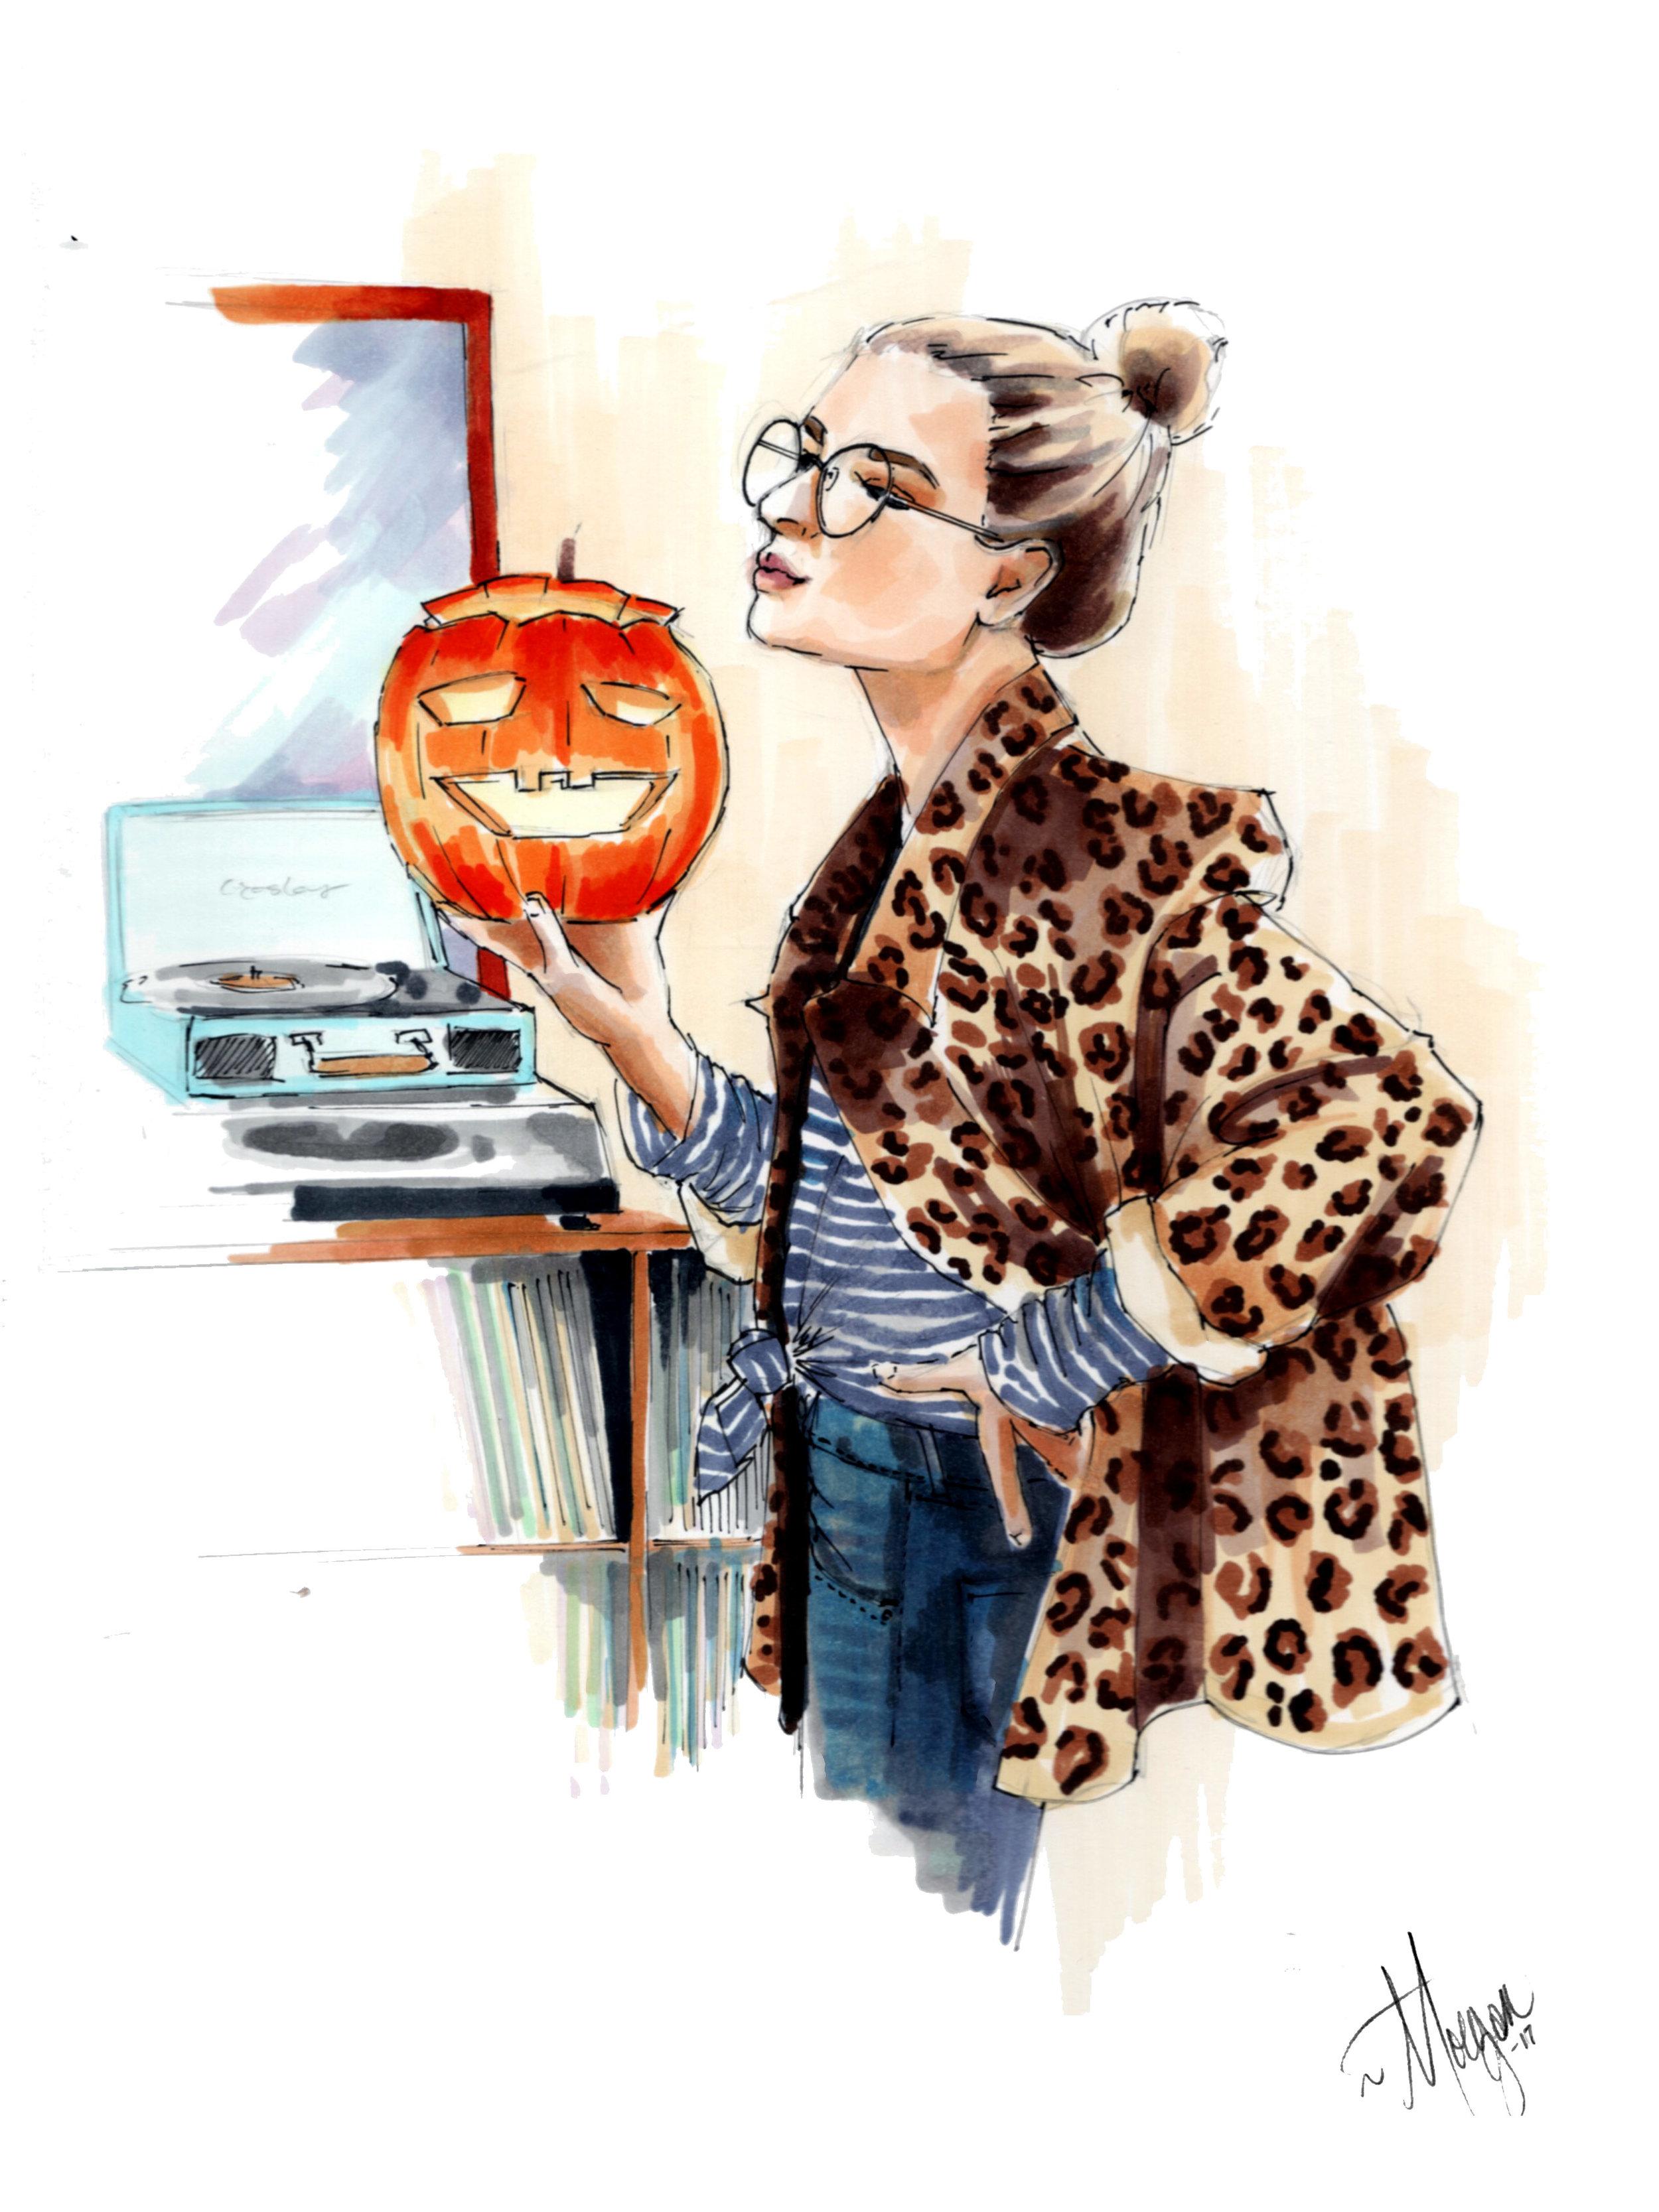 halloween-illustration-morgan-swank-studio.jpg